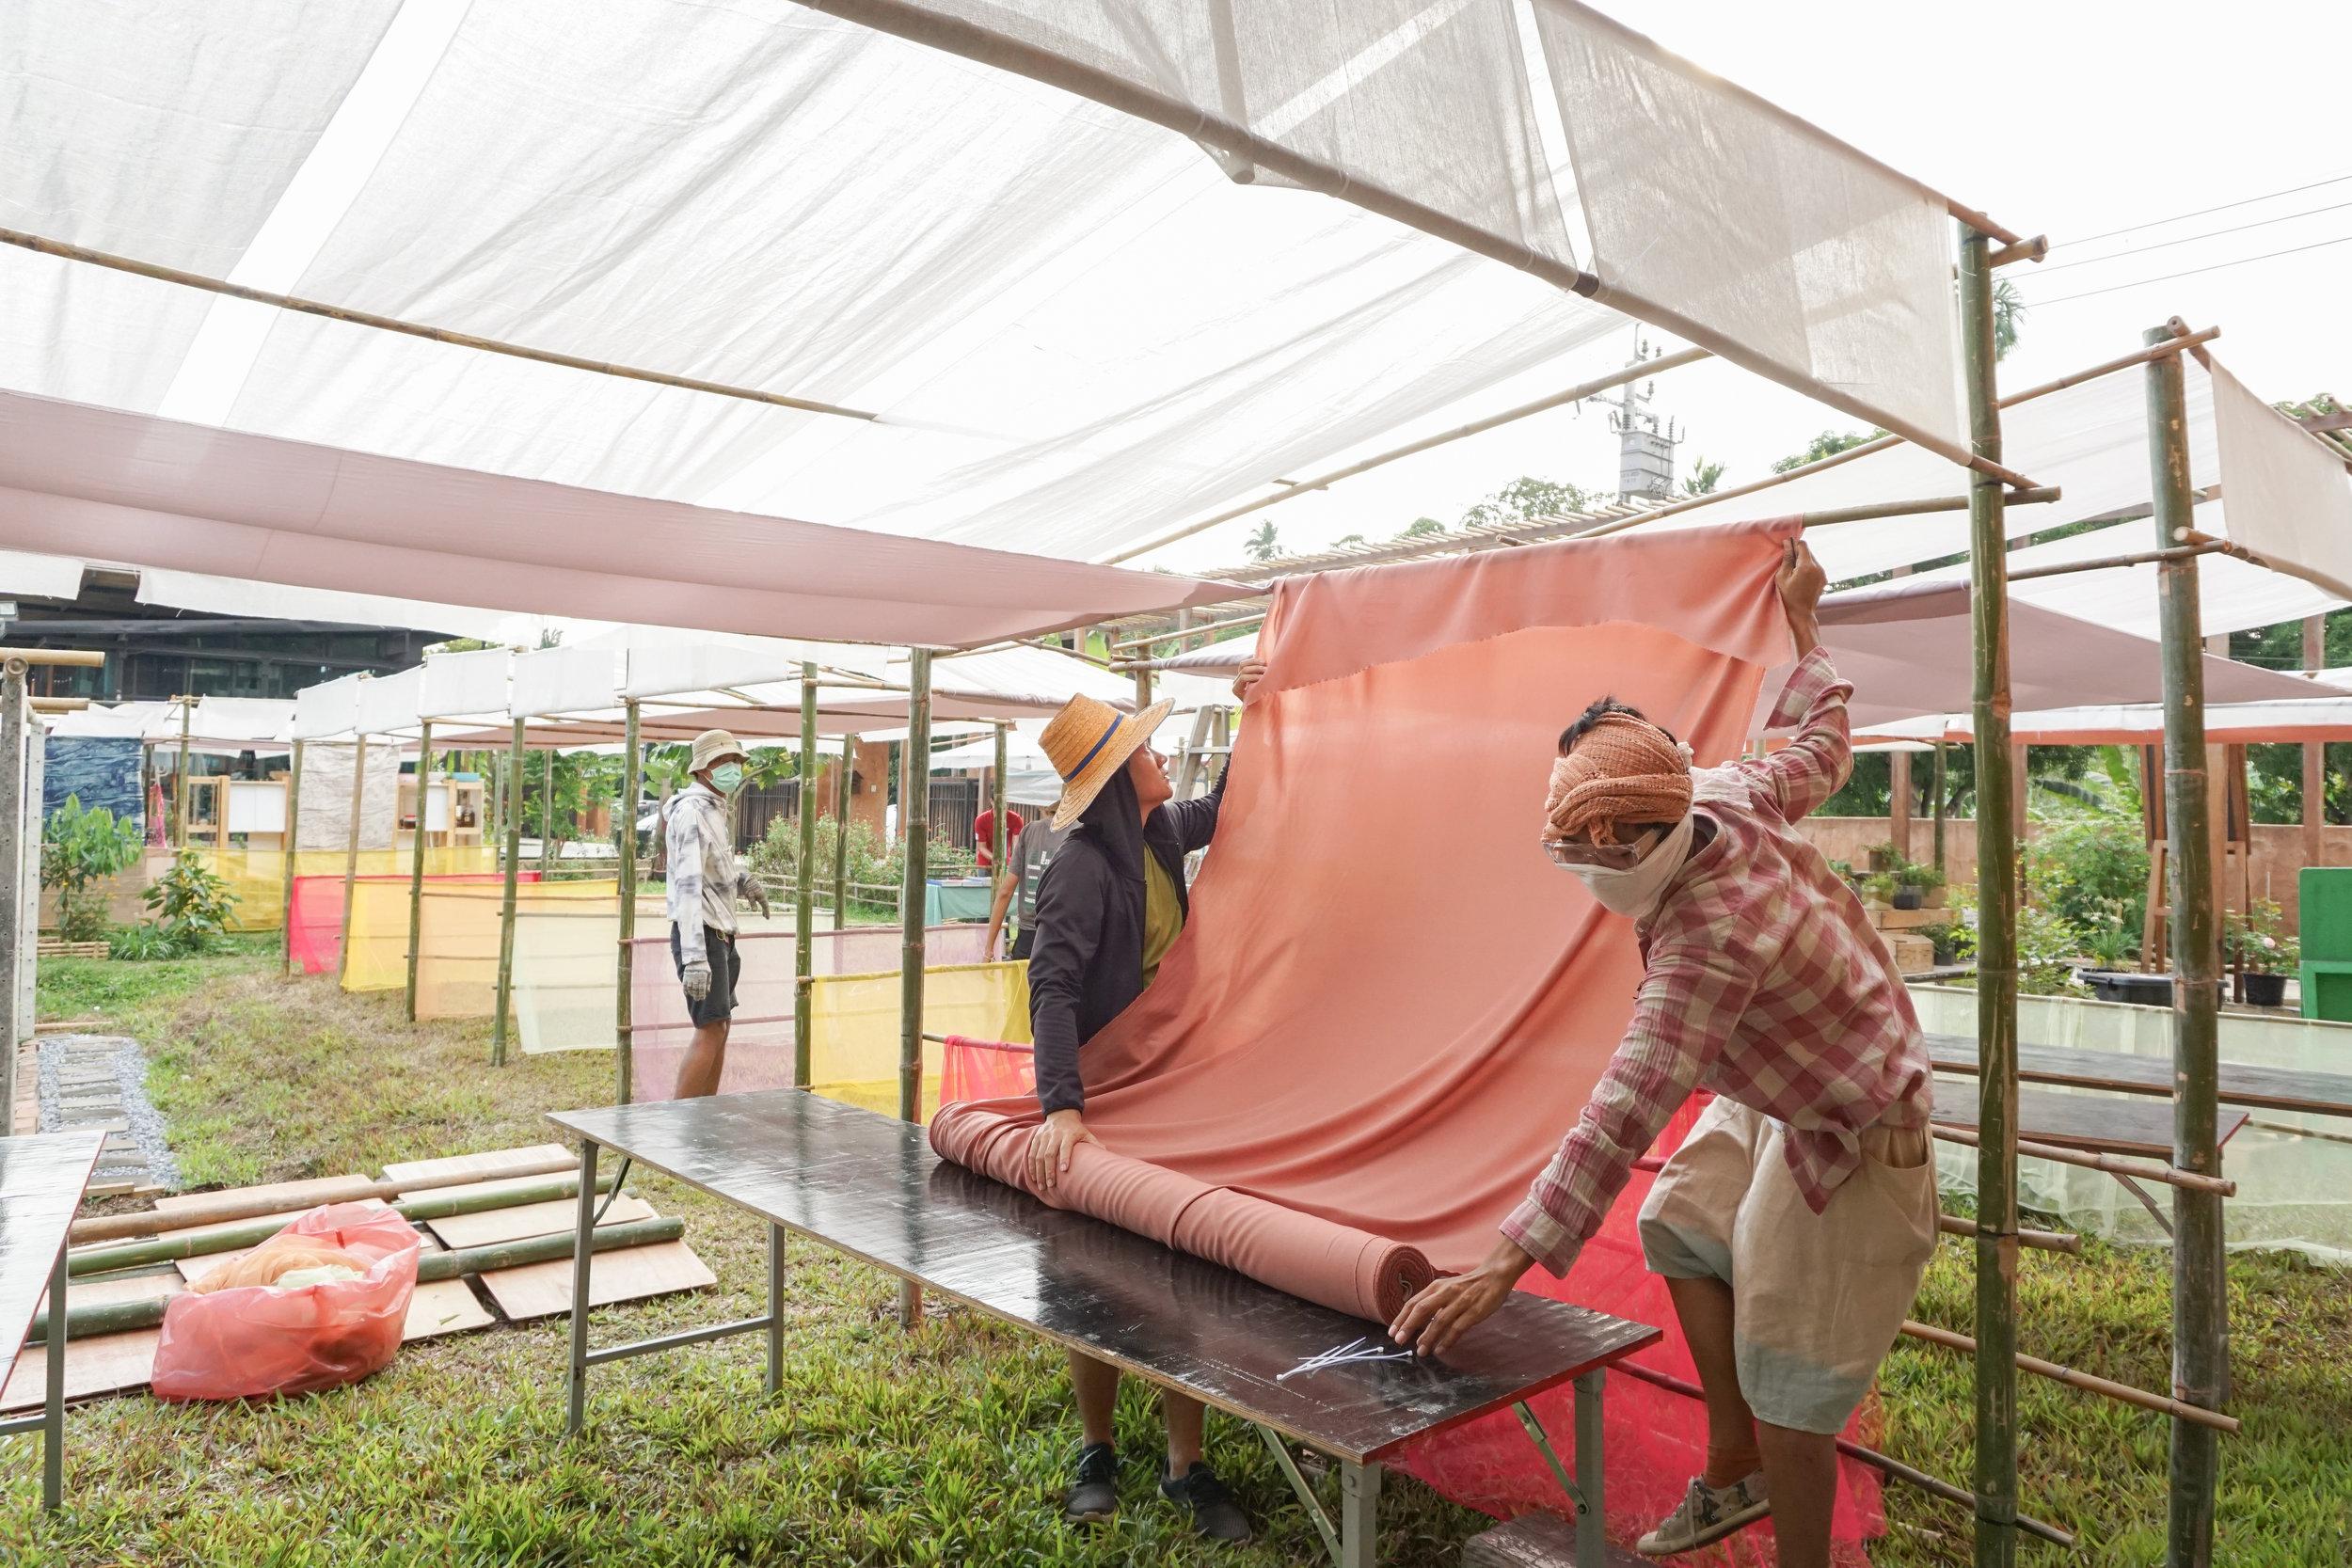 Openspace team building the Thai City Farm Festival on organic farming